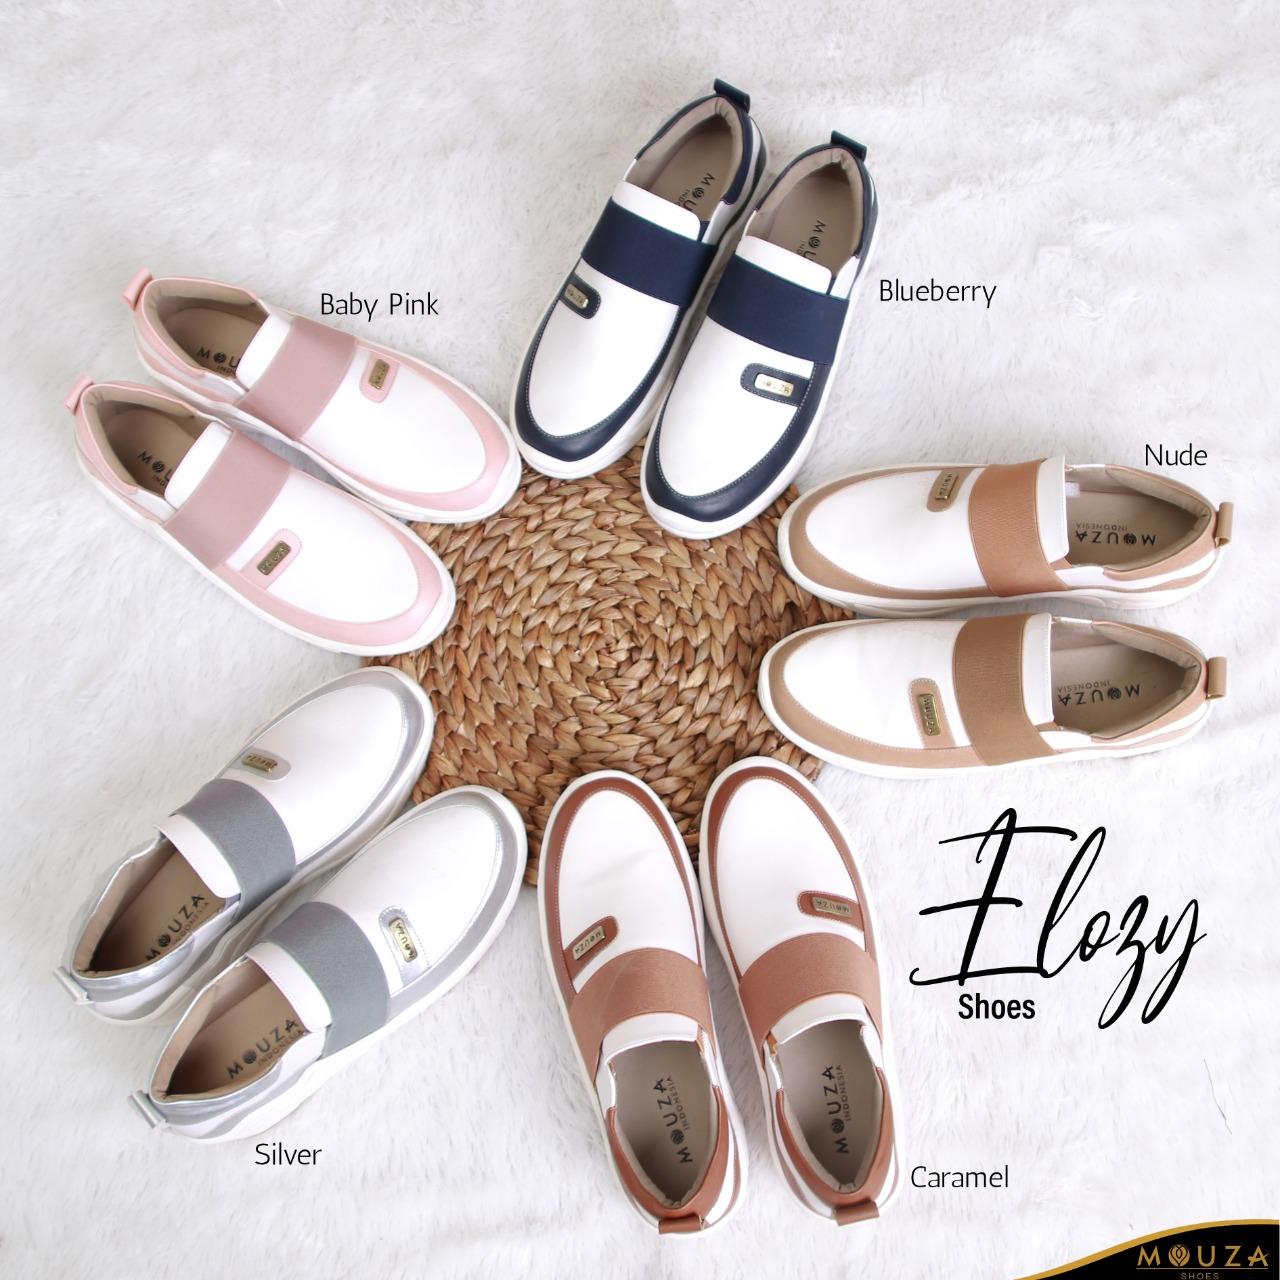 Elozy Shoes